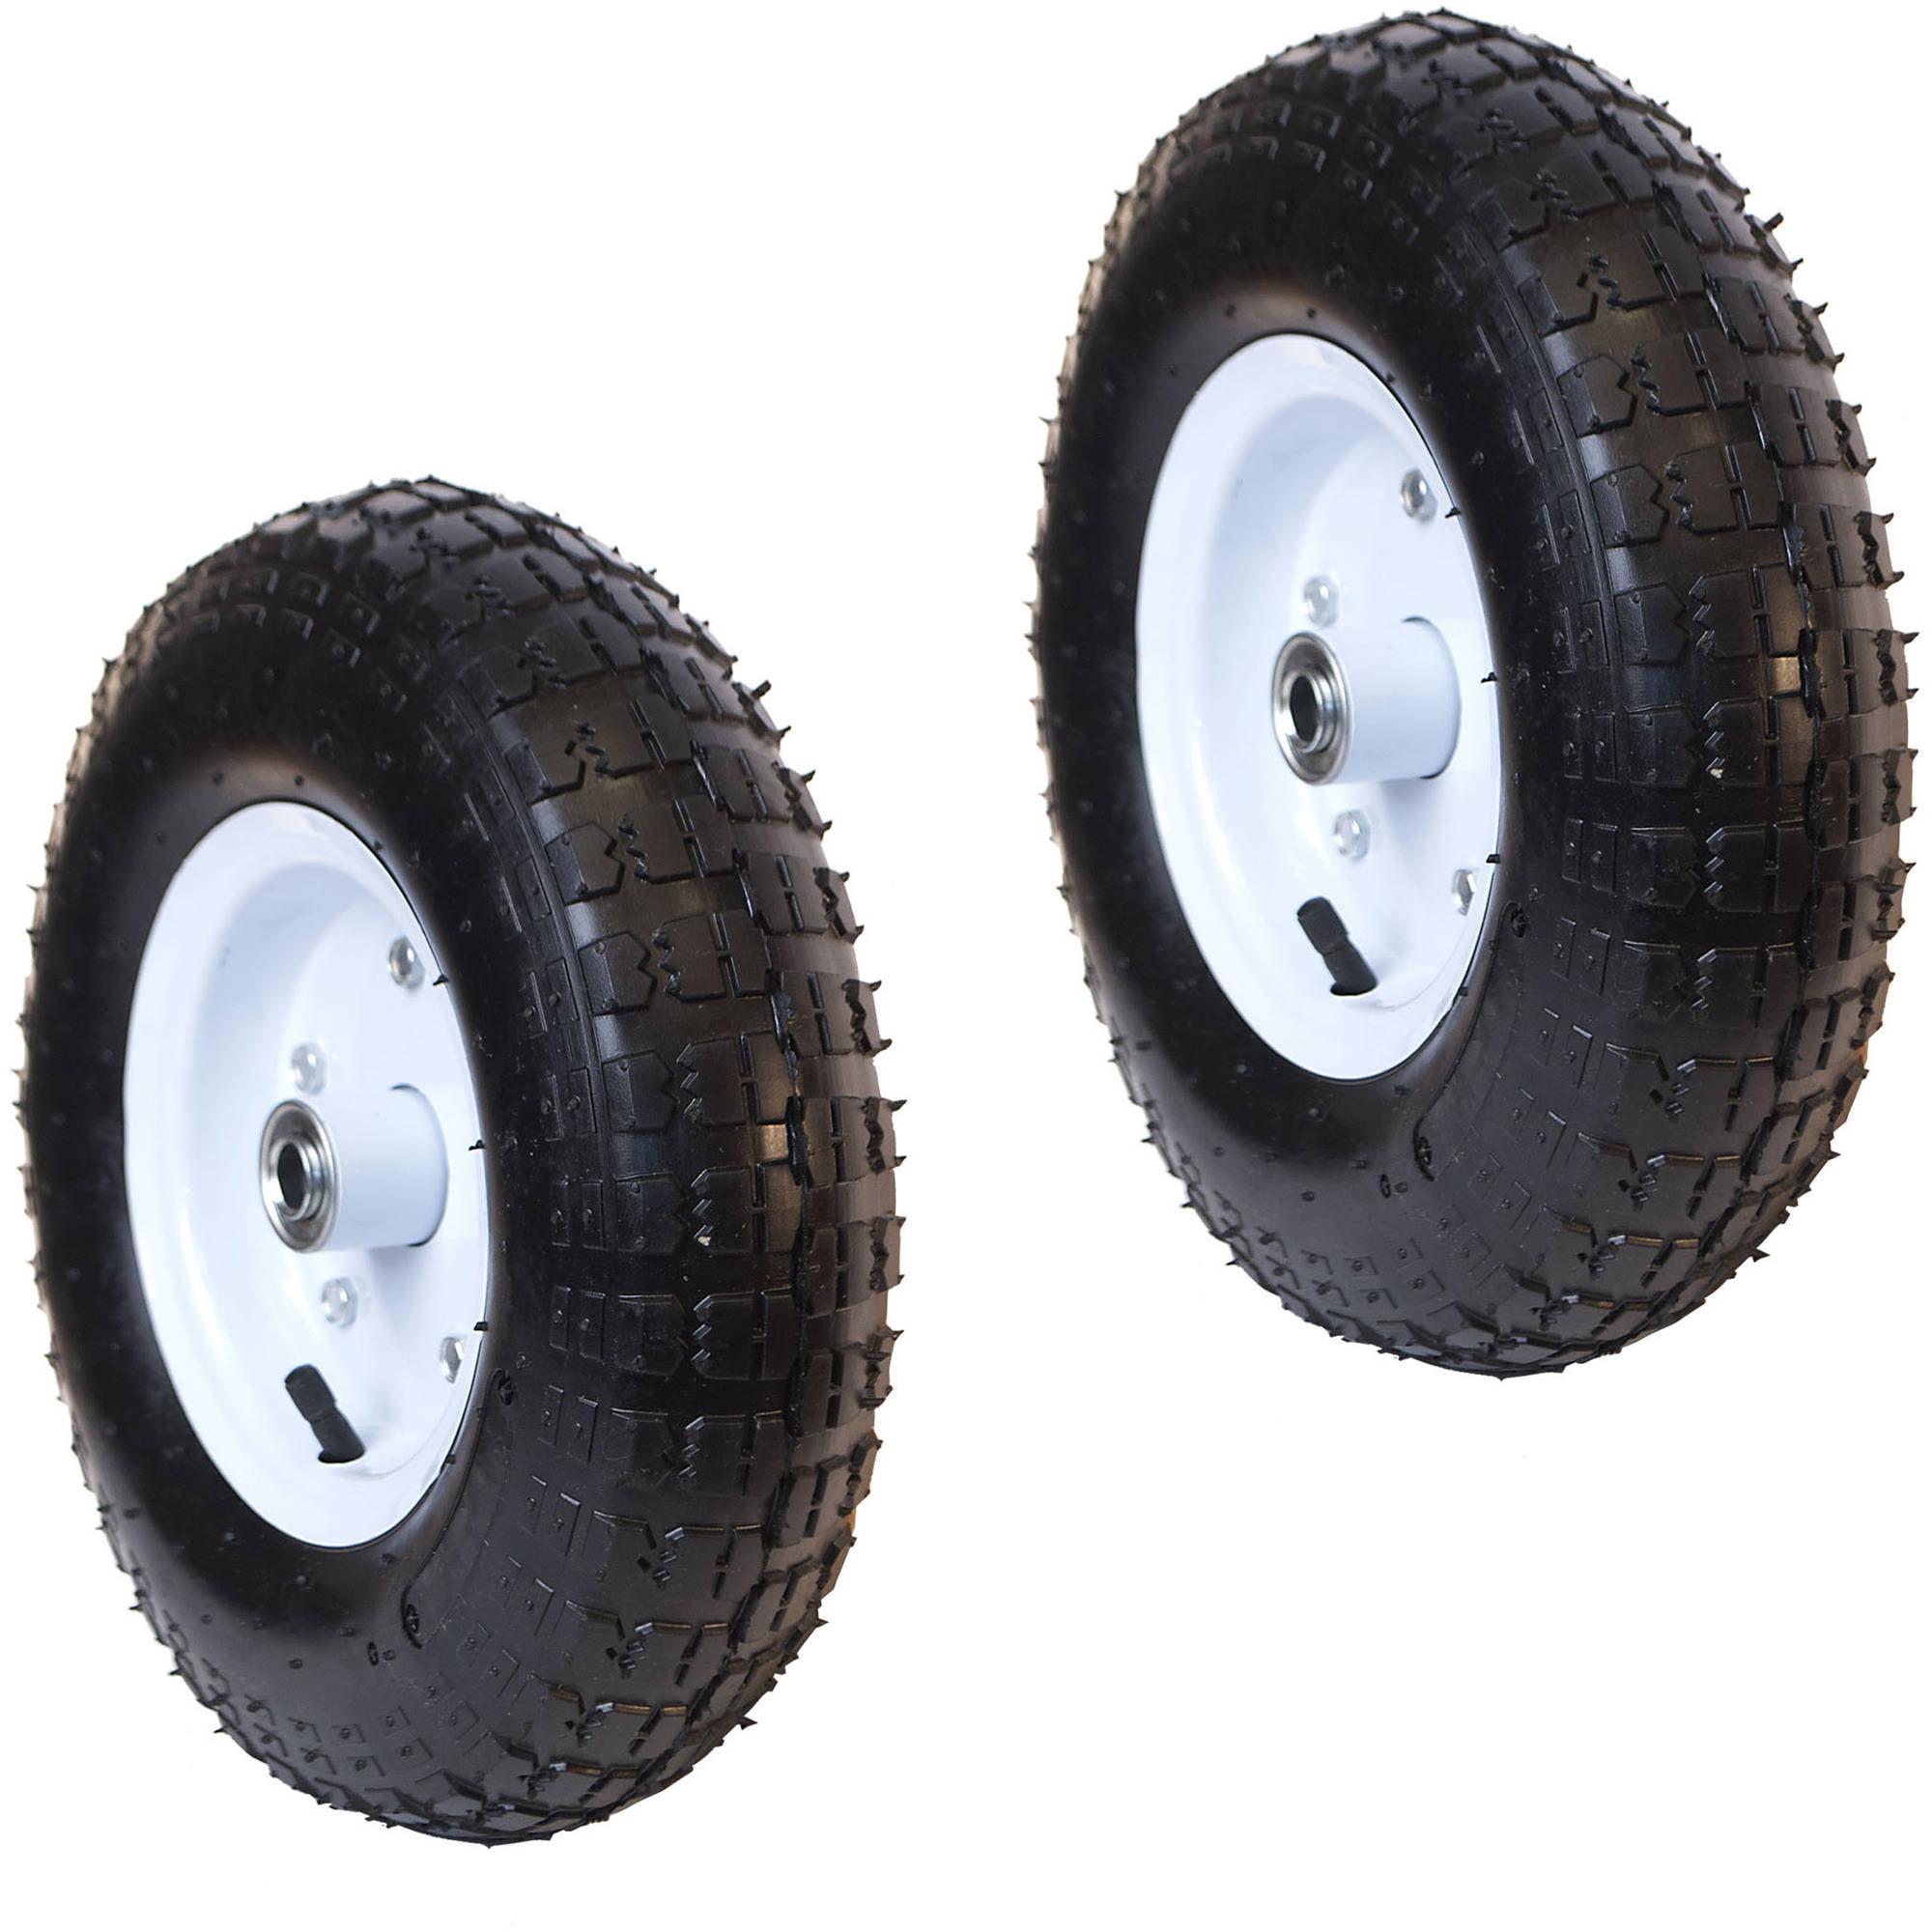 ALEKO 2WBAP13 Turf Pneumatic Replacement Welded Rim Wheel for Wheelbarrow 13 Inch Air... by ALEKO